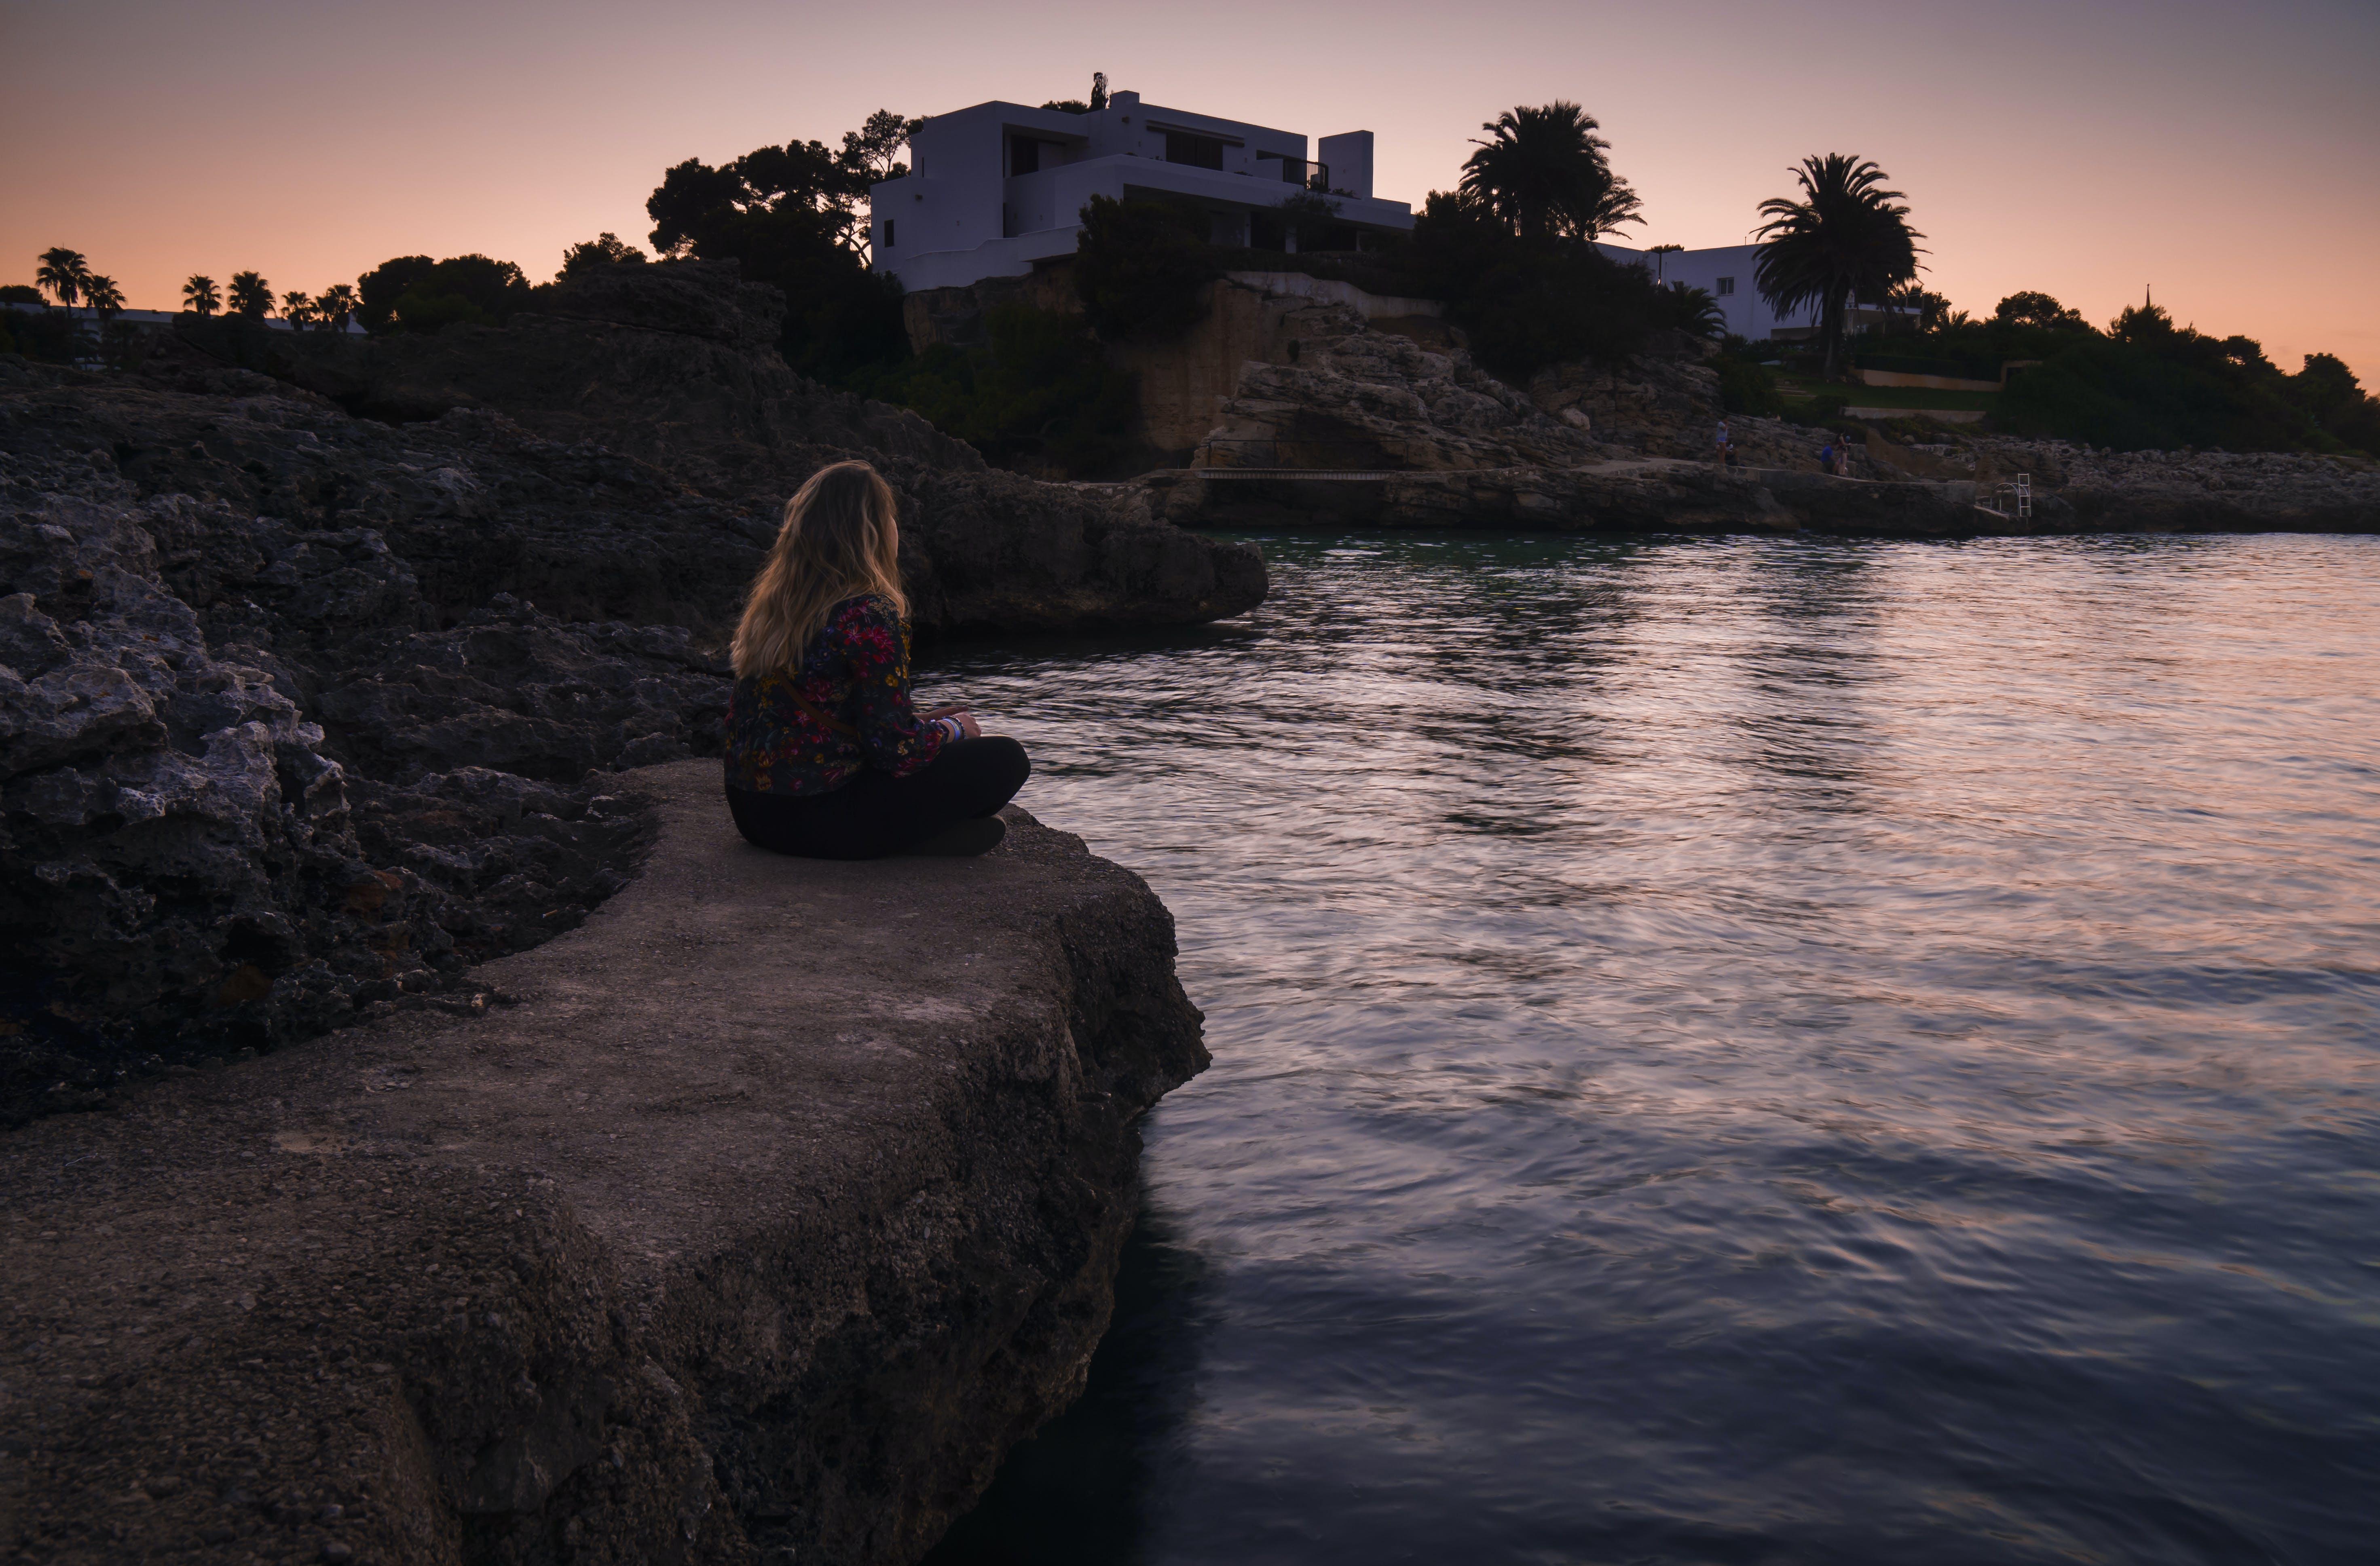 Woman Sitting on Edge of Rock Near Body of Water